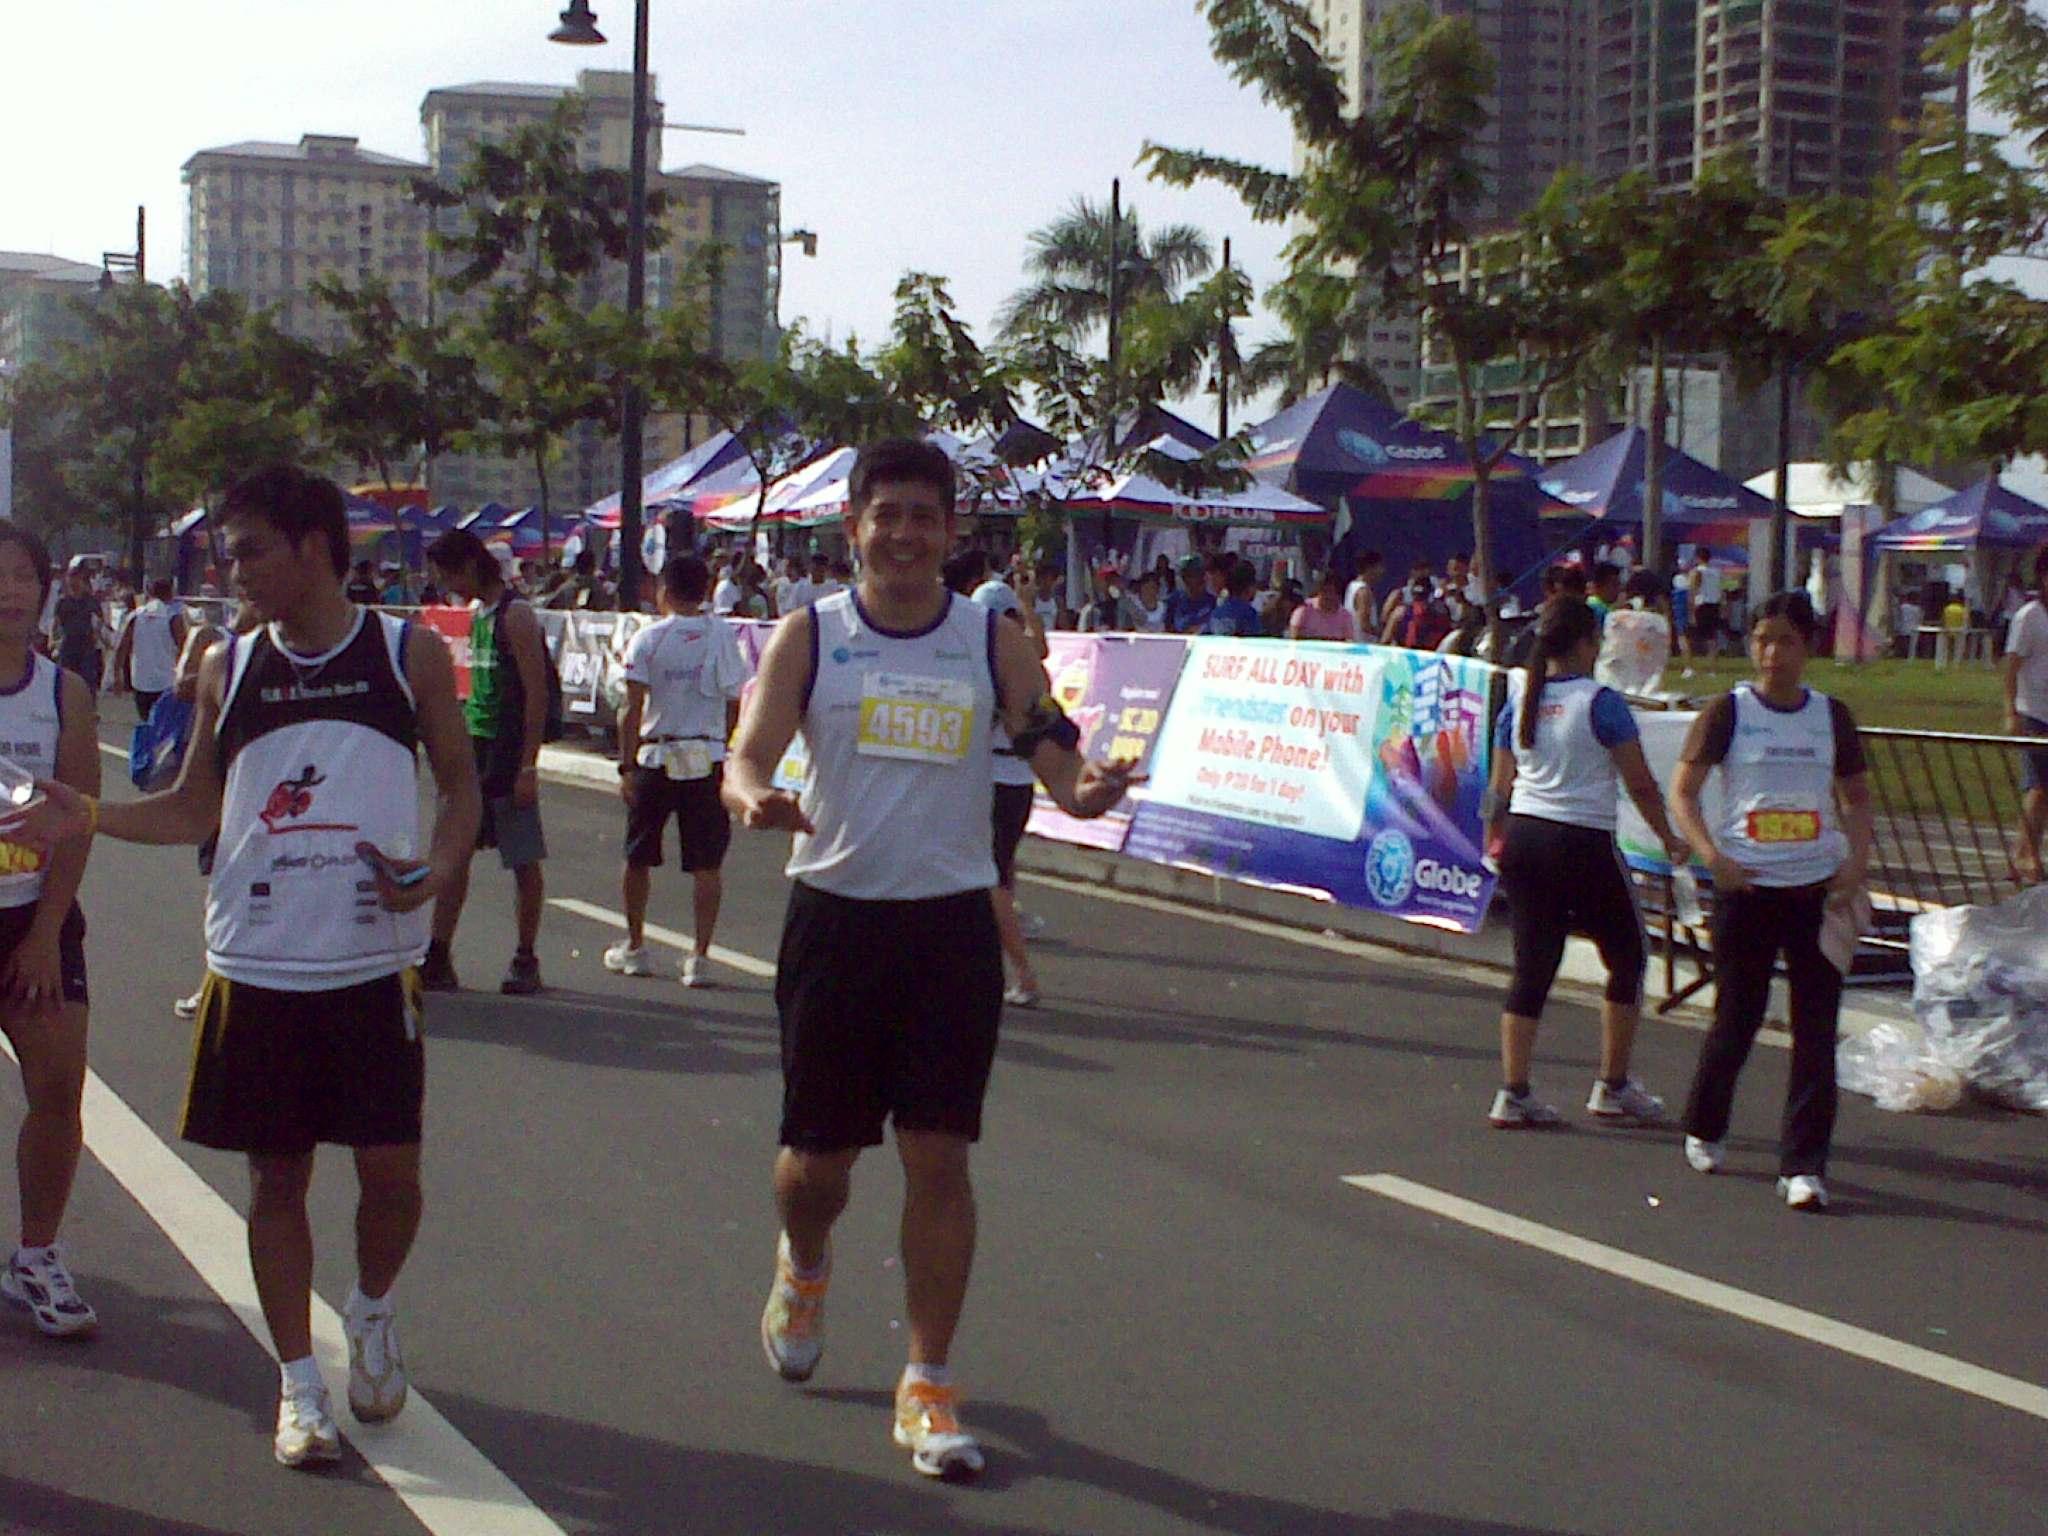 Kuya Raoul at the Finish Line